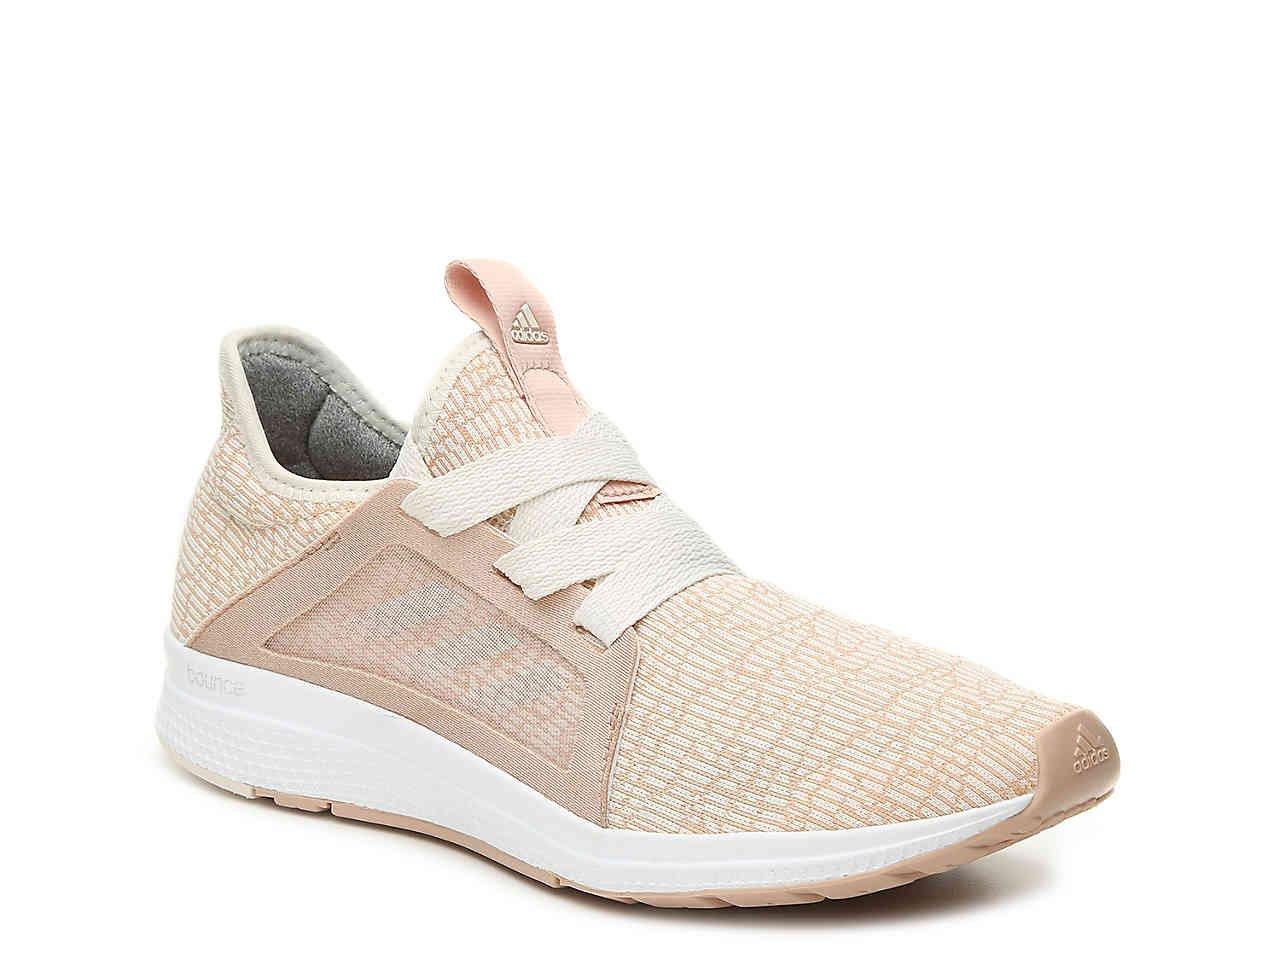 adidas Edge Lux Lightweight Running Shoe - Women's Women's Shoes   DSW